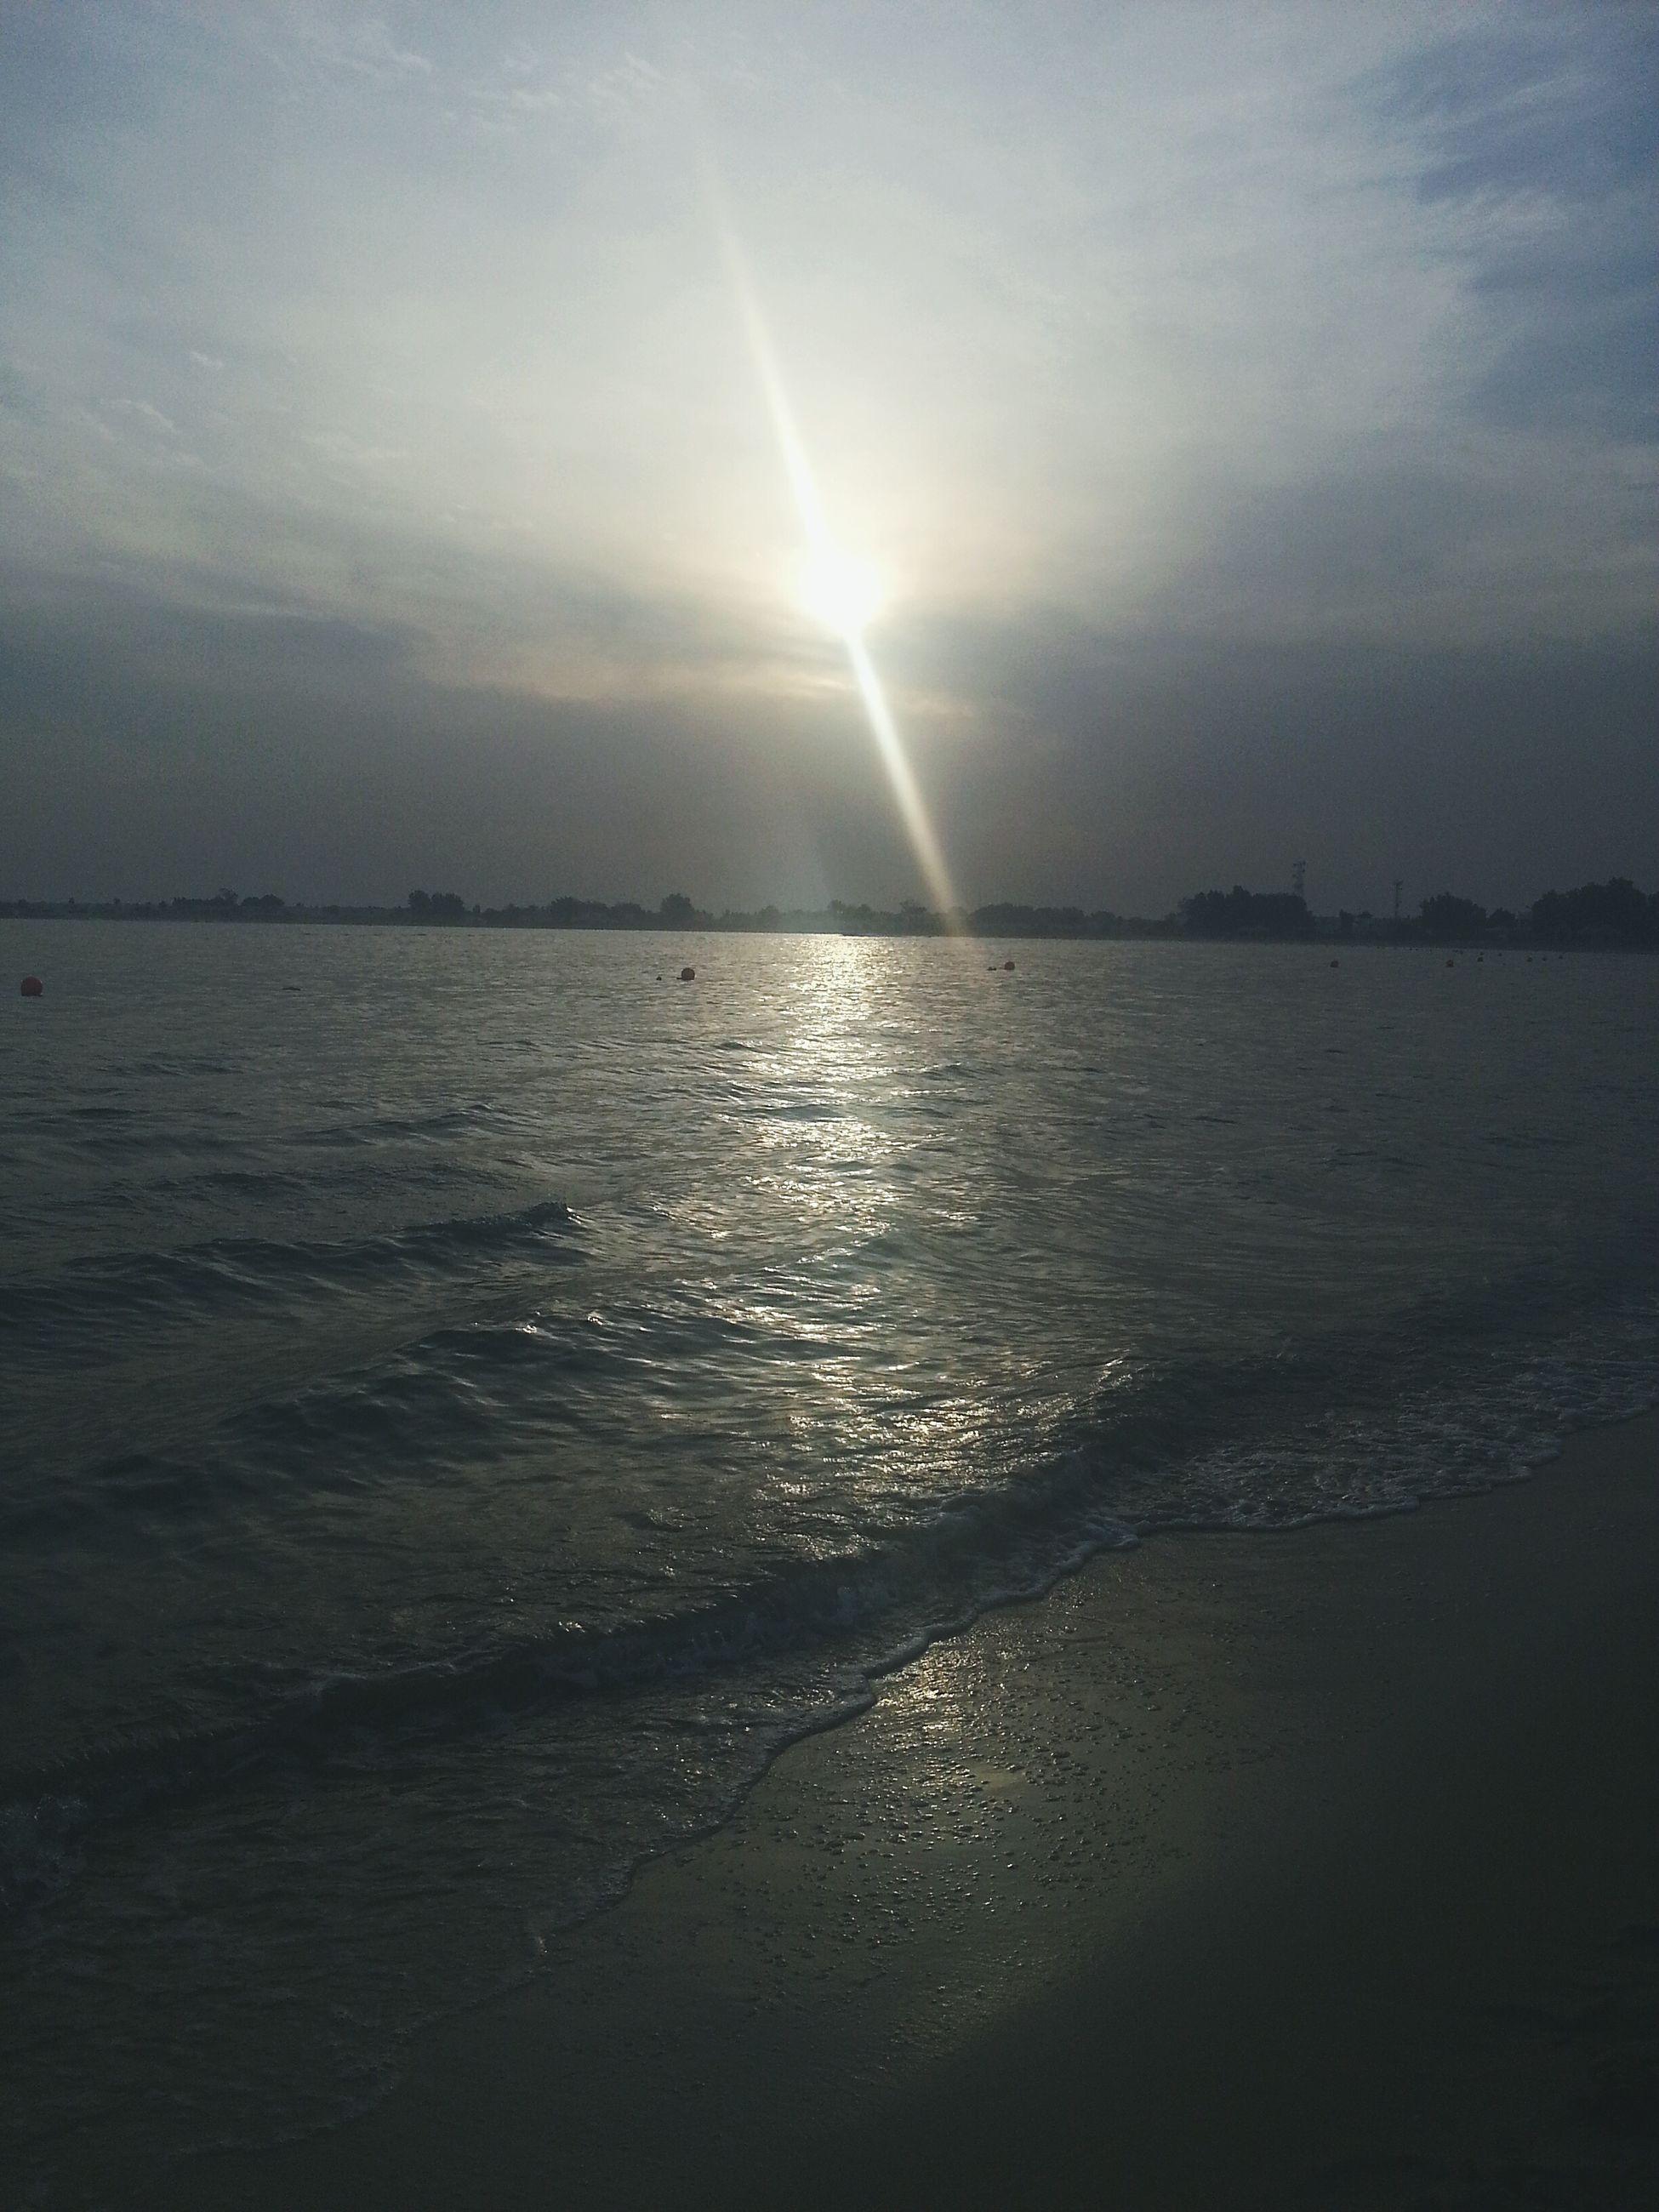 water, sea, tranquil scene, scenics, tranquility, sky, horizon over water, beauty in nature, sun, beach, reflection, nature, sunset, shore, idyllic, cloud - sky, sunlight, sunbeam, waterfront, remote